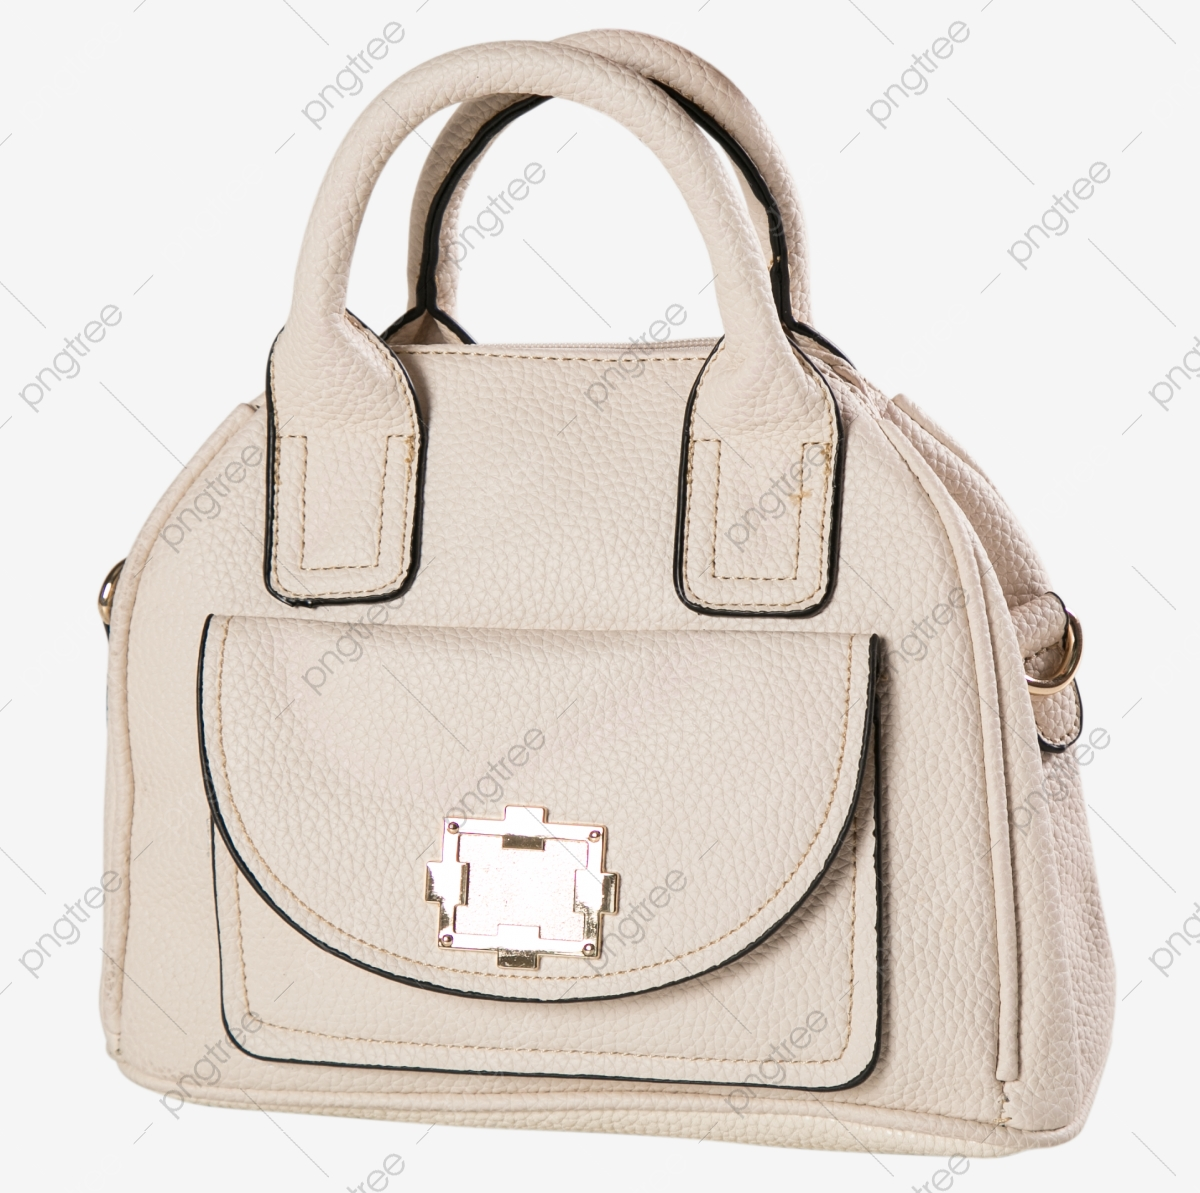 Handbag, Cartera De Mujer, Cartera, Gif PNG Transparent Clipart ... picture library download